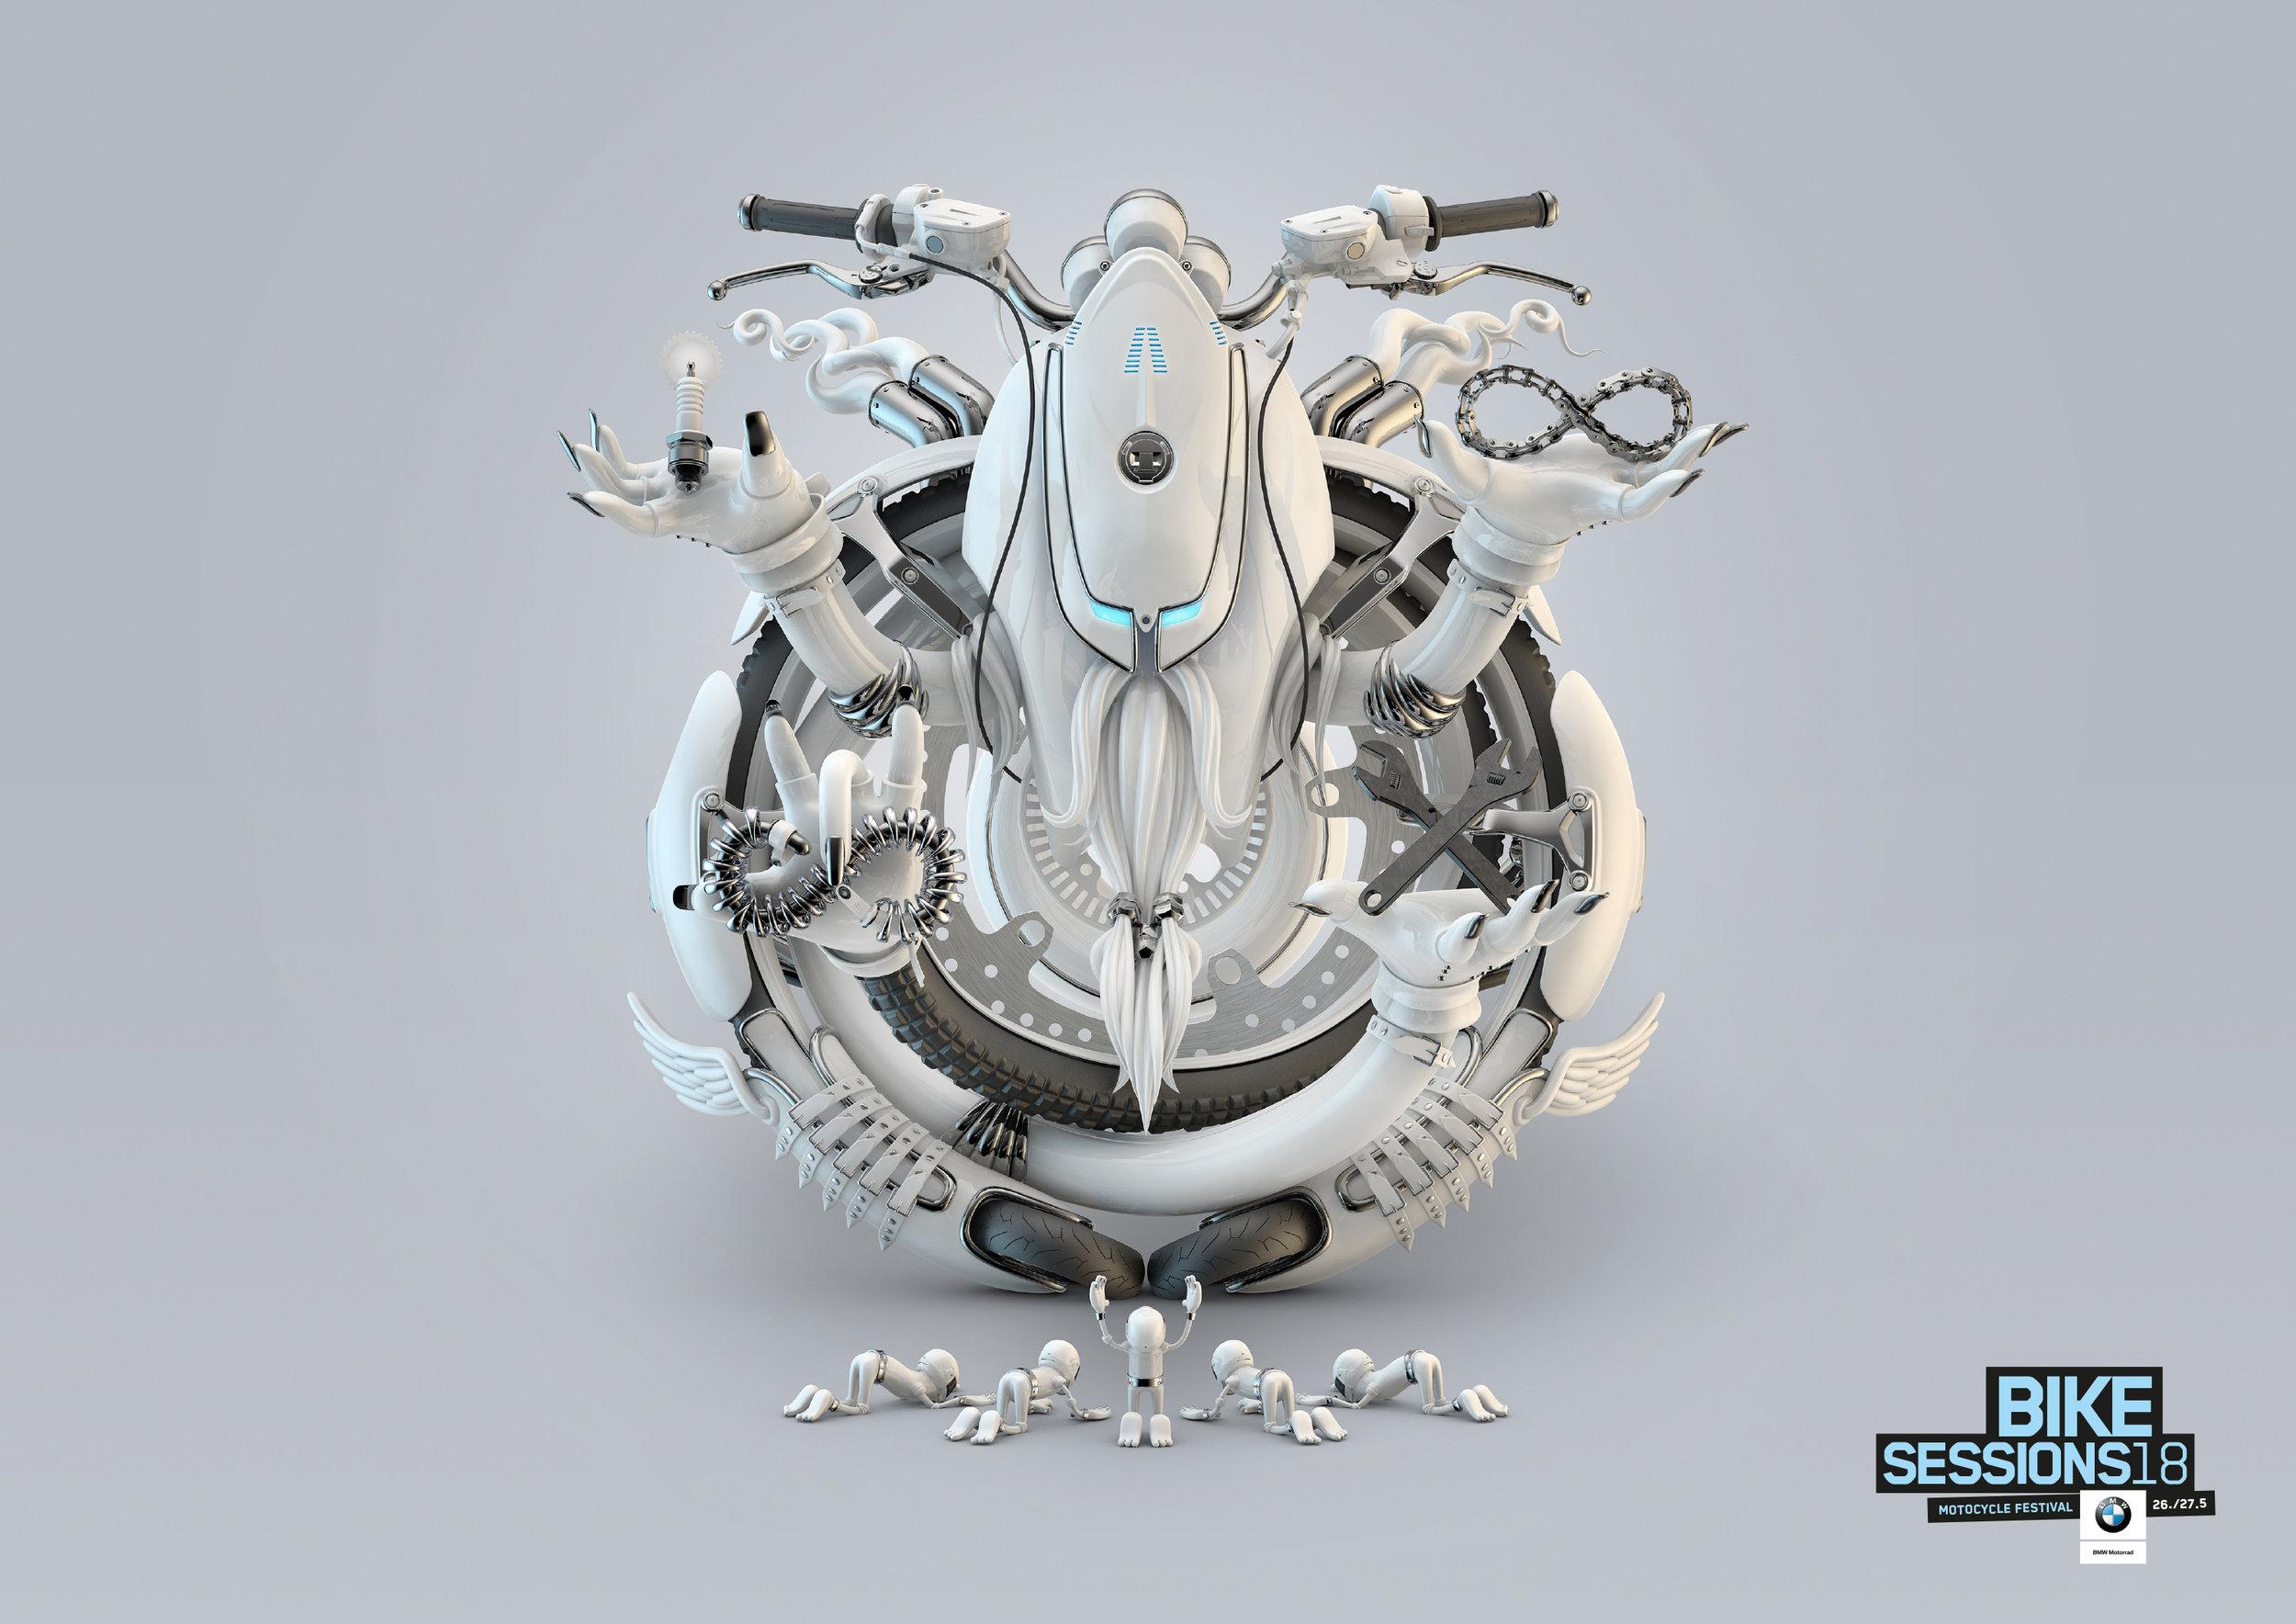 BMW Motorrad   Visual Bikesessions  Serviceplan Suisse